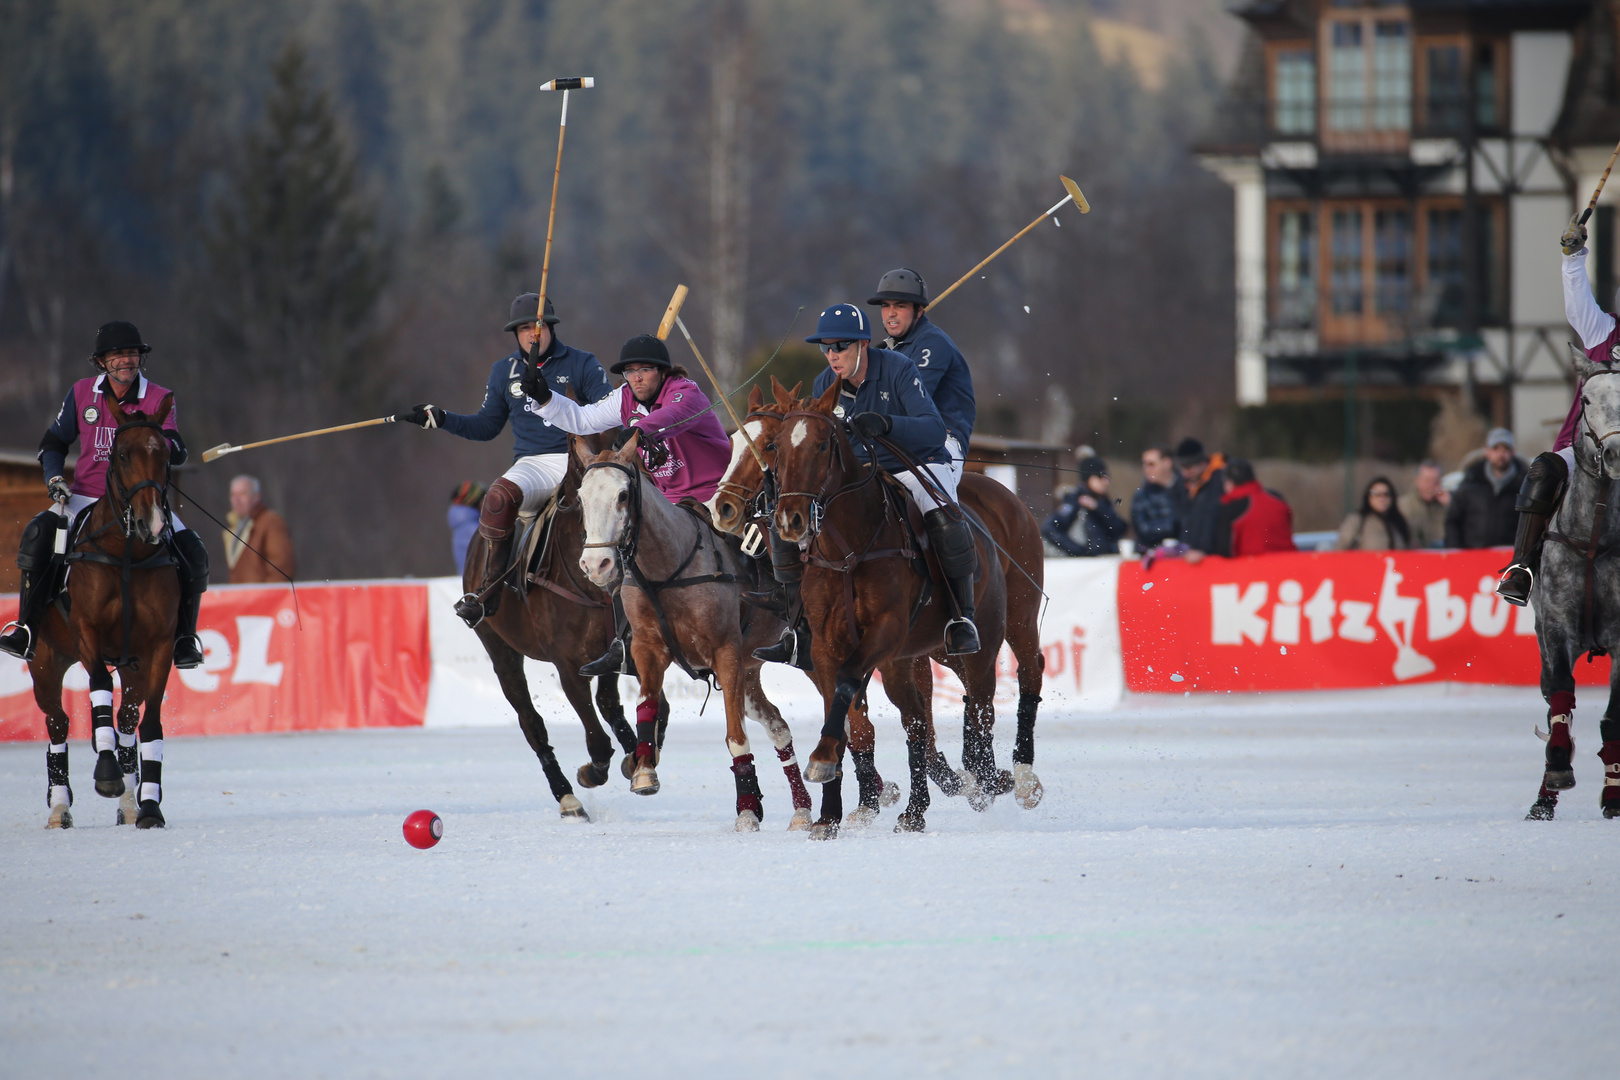 Winterpolo 2014 Kitzbühel